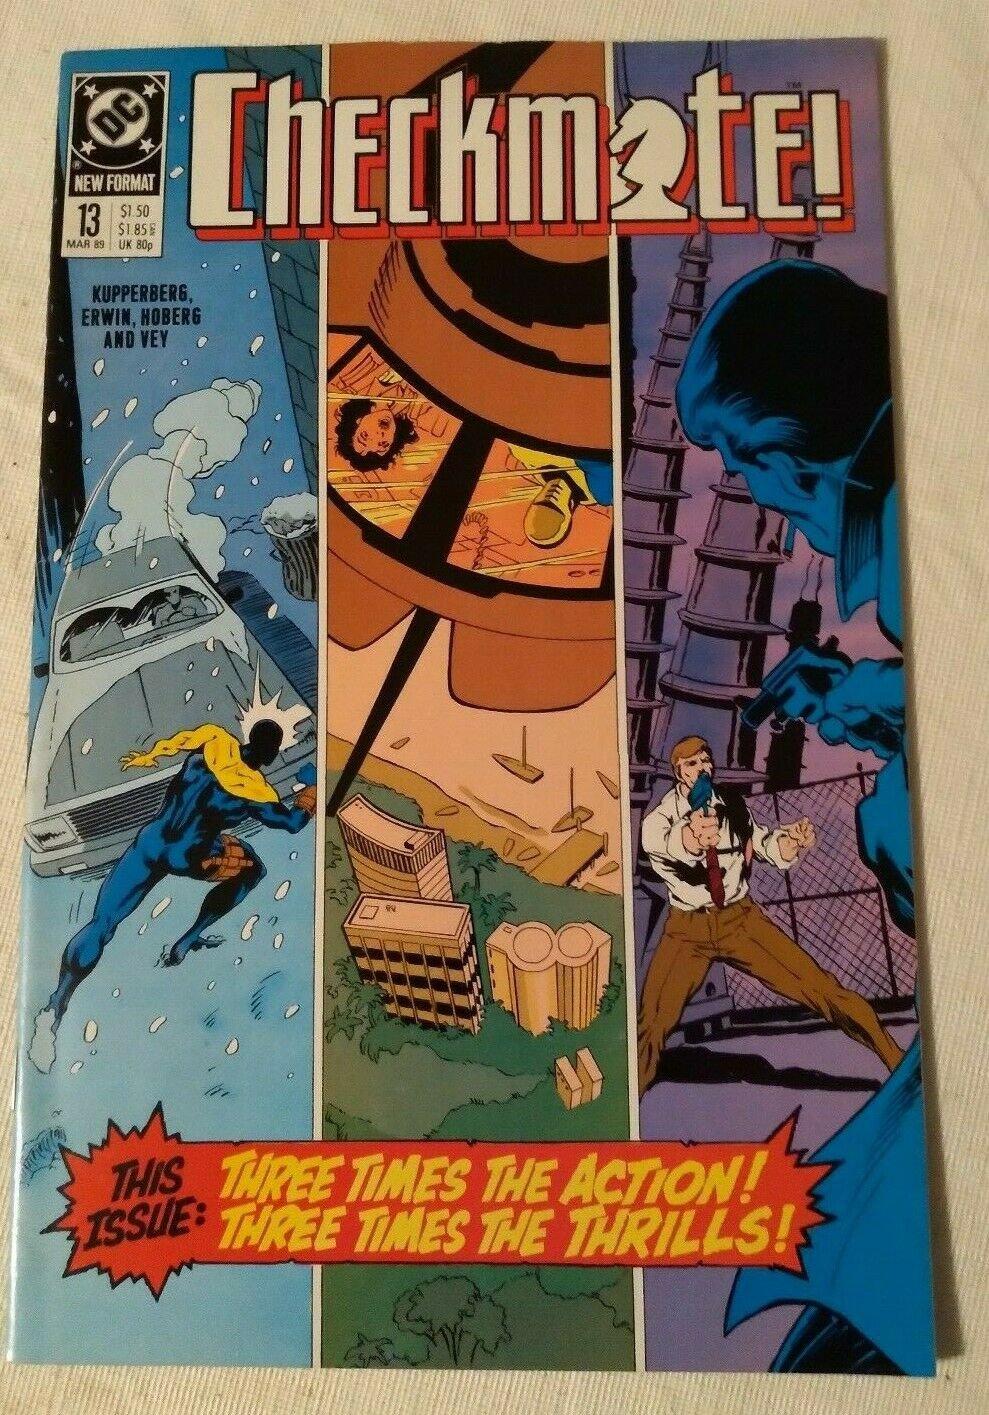 Checkmate Vol 1 #13 VF/NM DC Comics